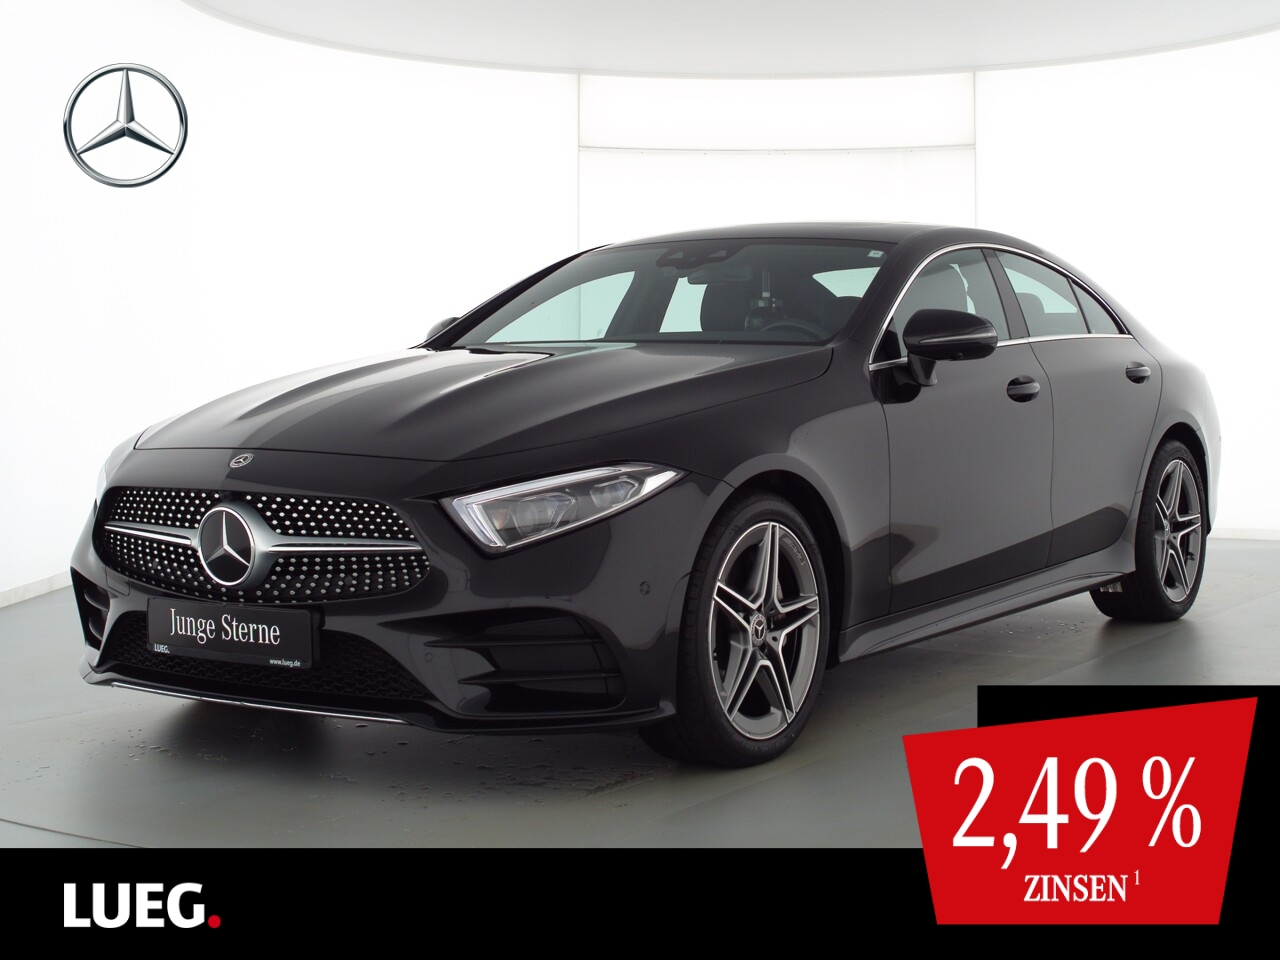 Mercedes-Benz CLS 400 finanzieren